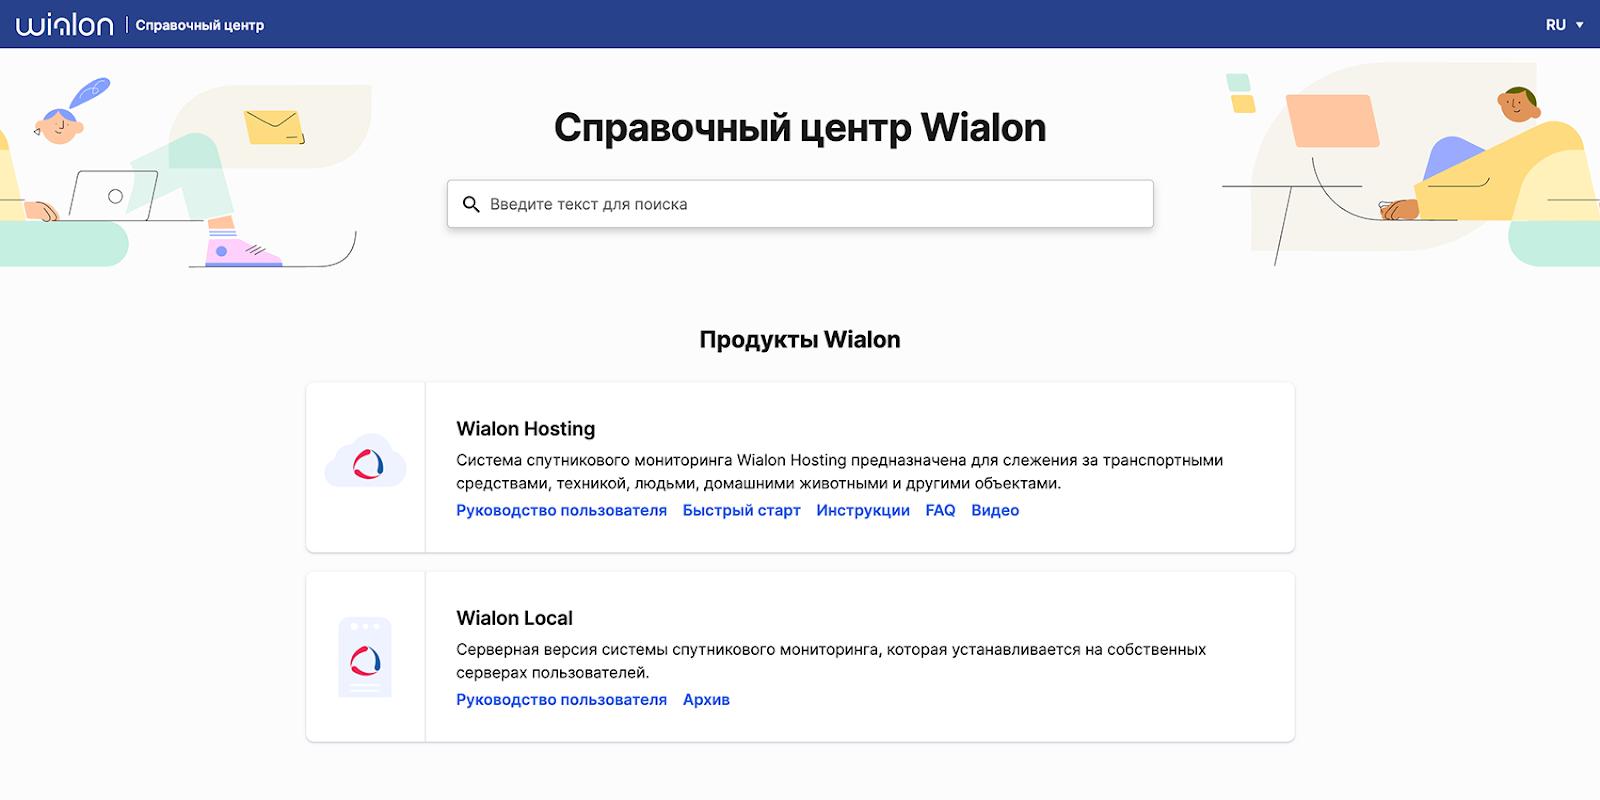 Справочный центр Wialon